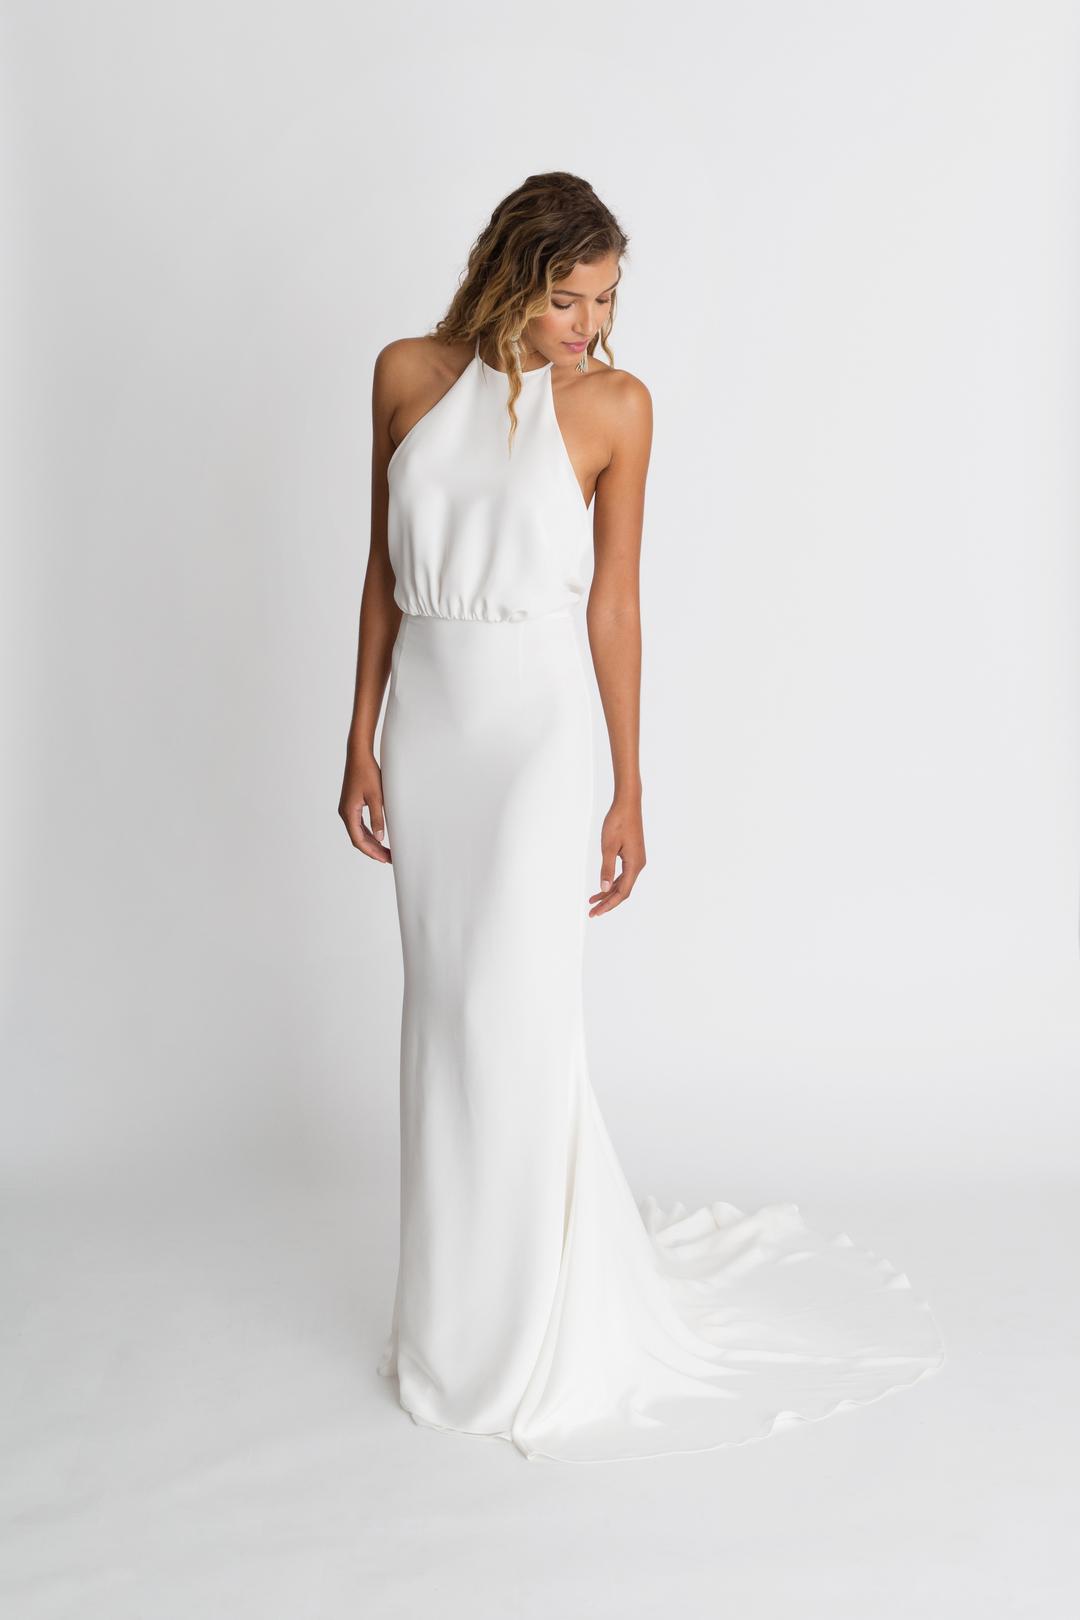 Dress main 2x 1543695526